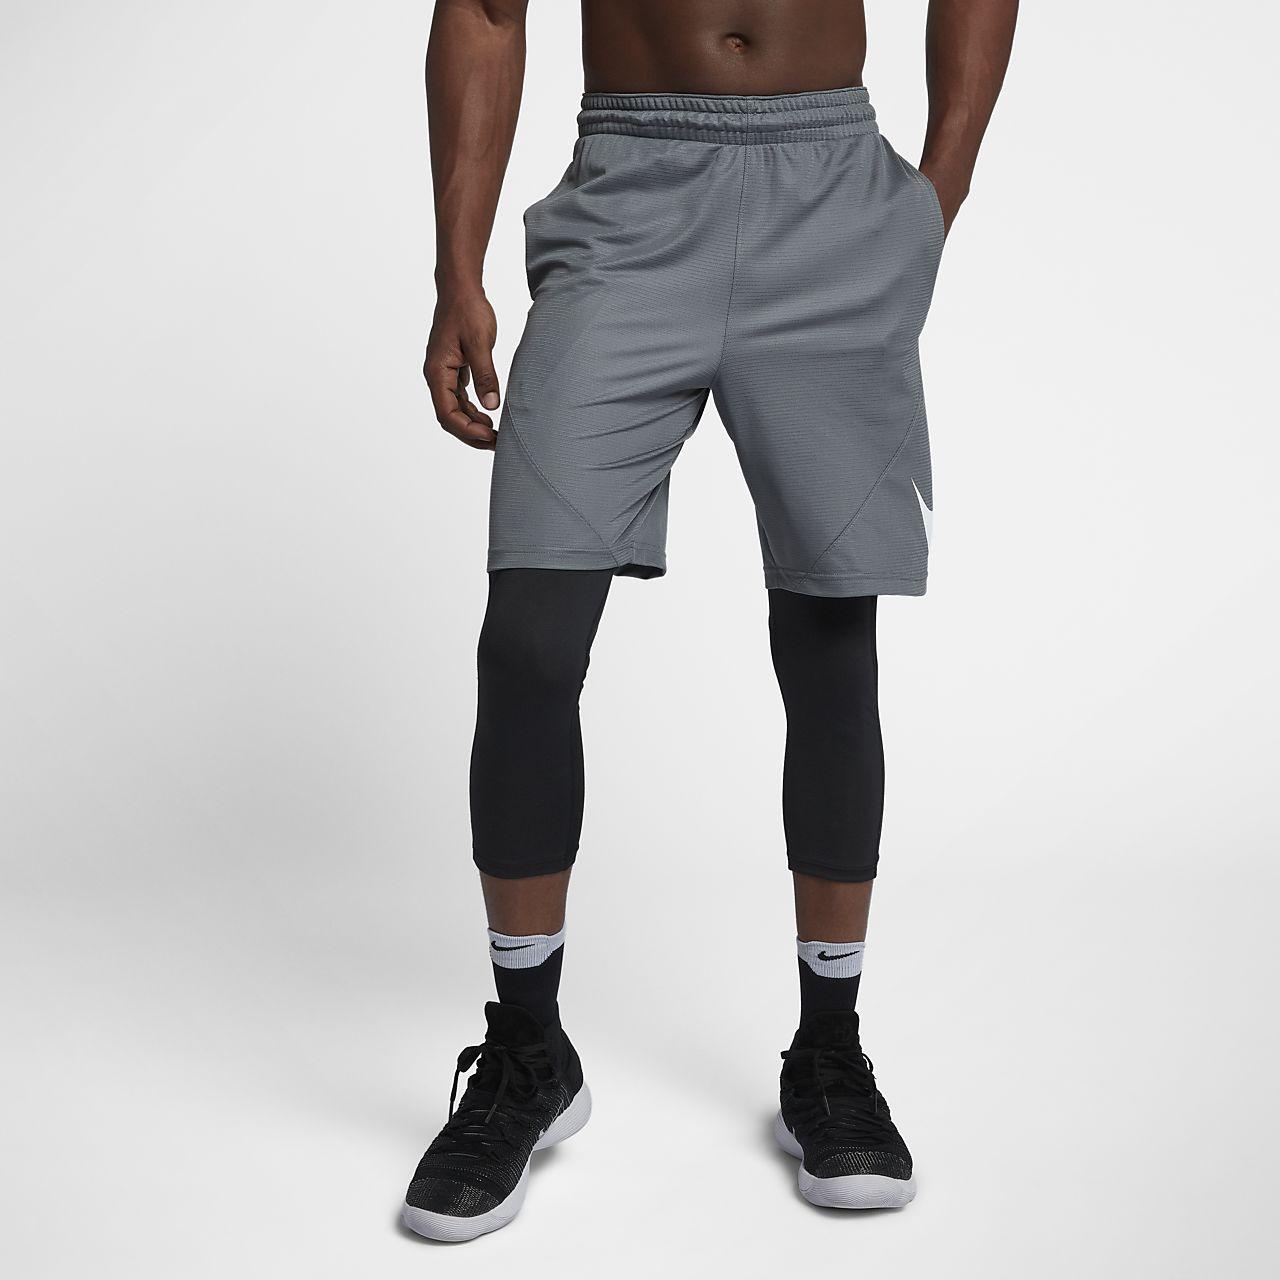 0debcb057 Nike Men s 9